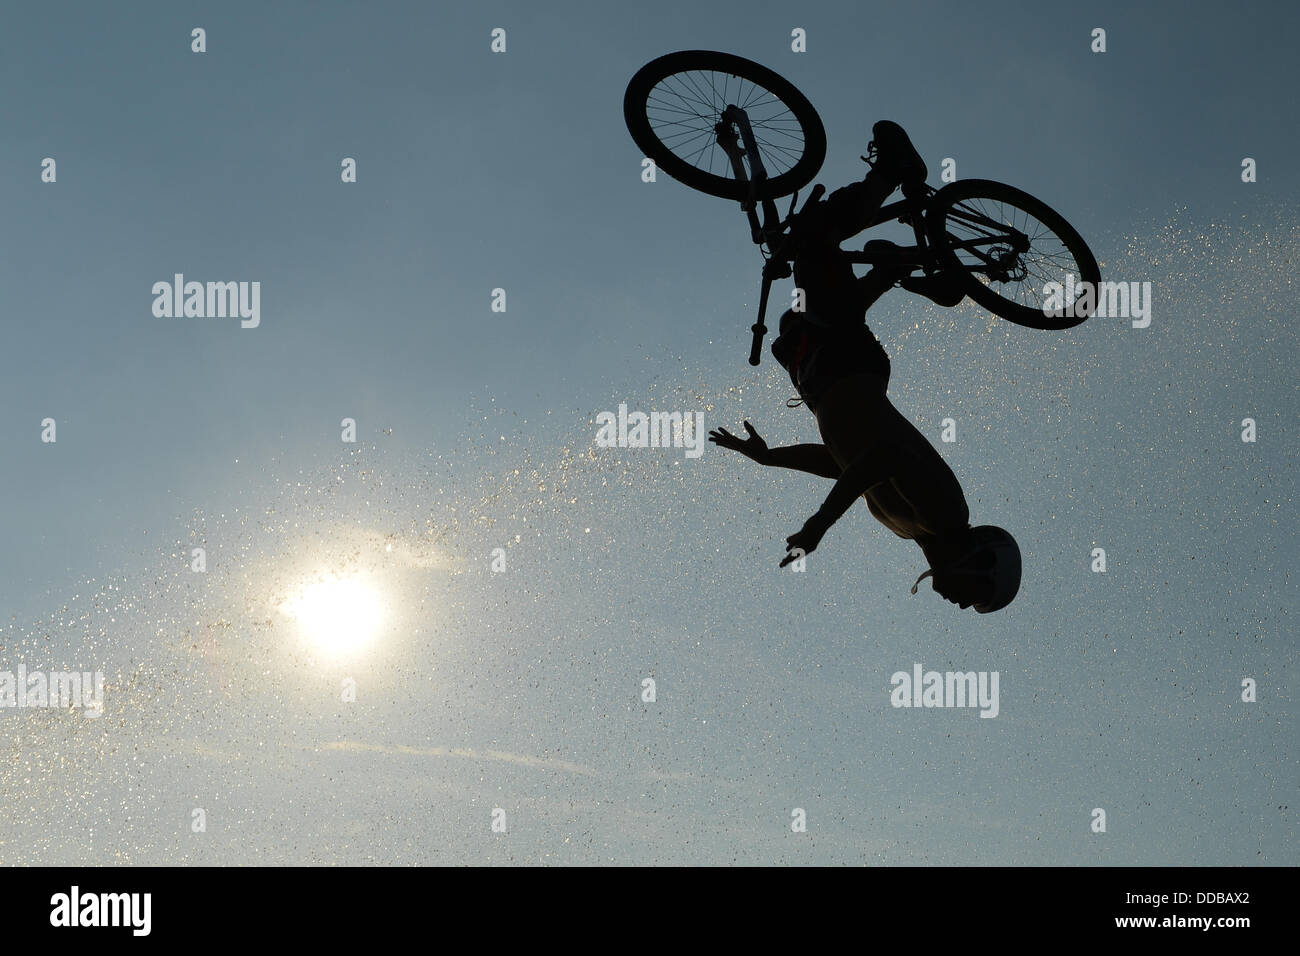 Dirt Jumper Stockfotos & Dirt Jumper Bilder - Alamy